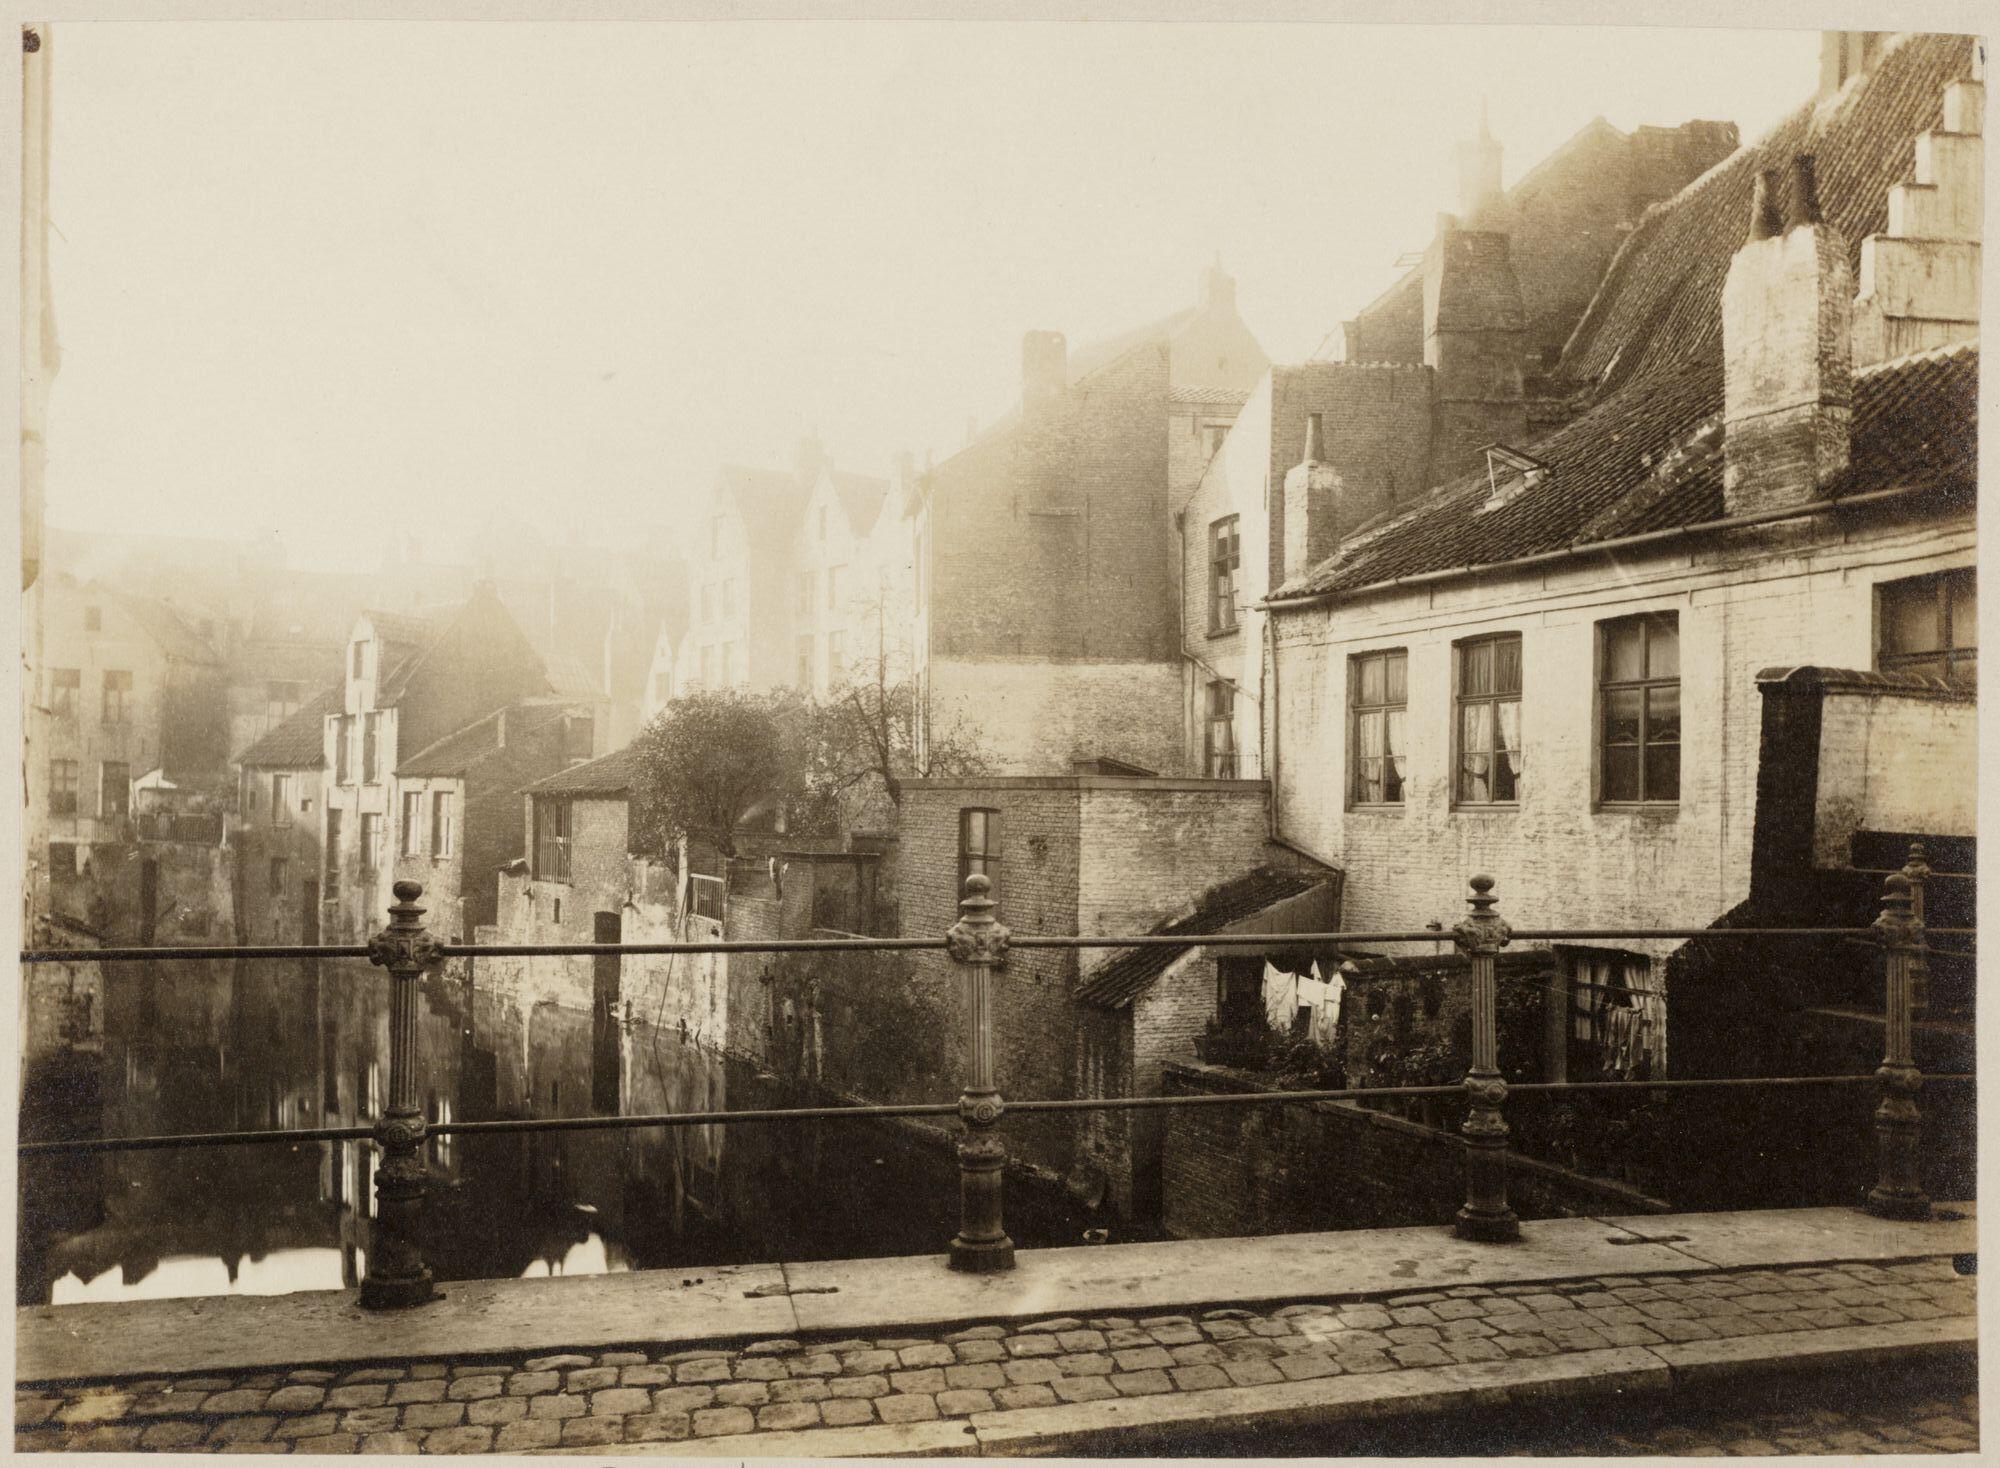 Gent: Oude Houtlei